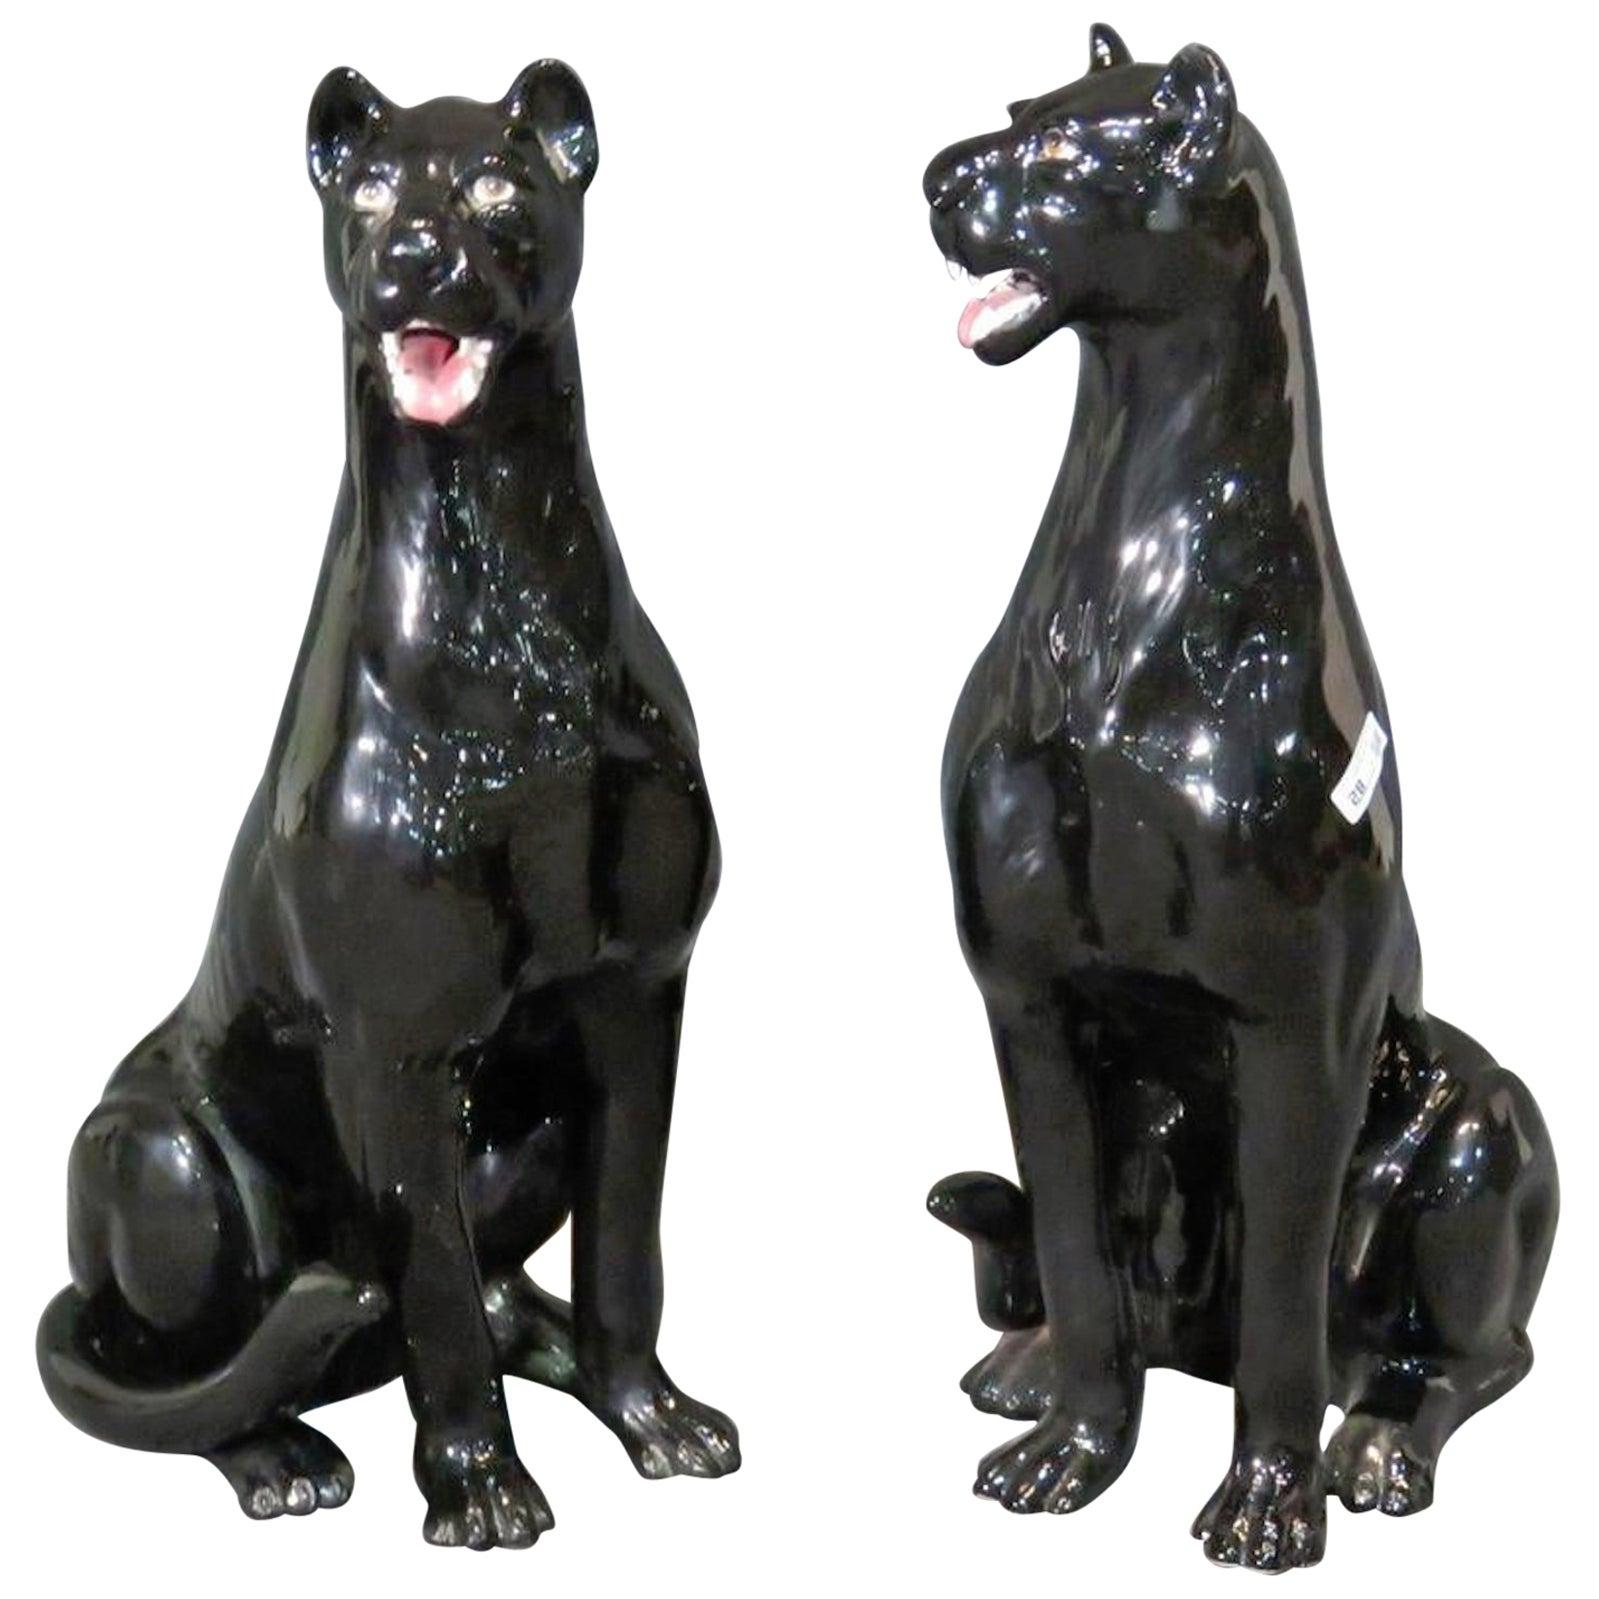 Pair of Ceramic Black Panthers